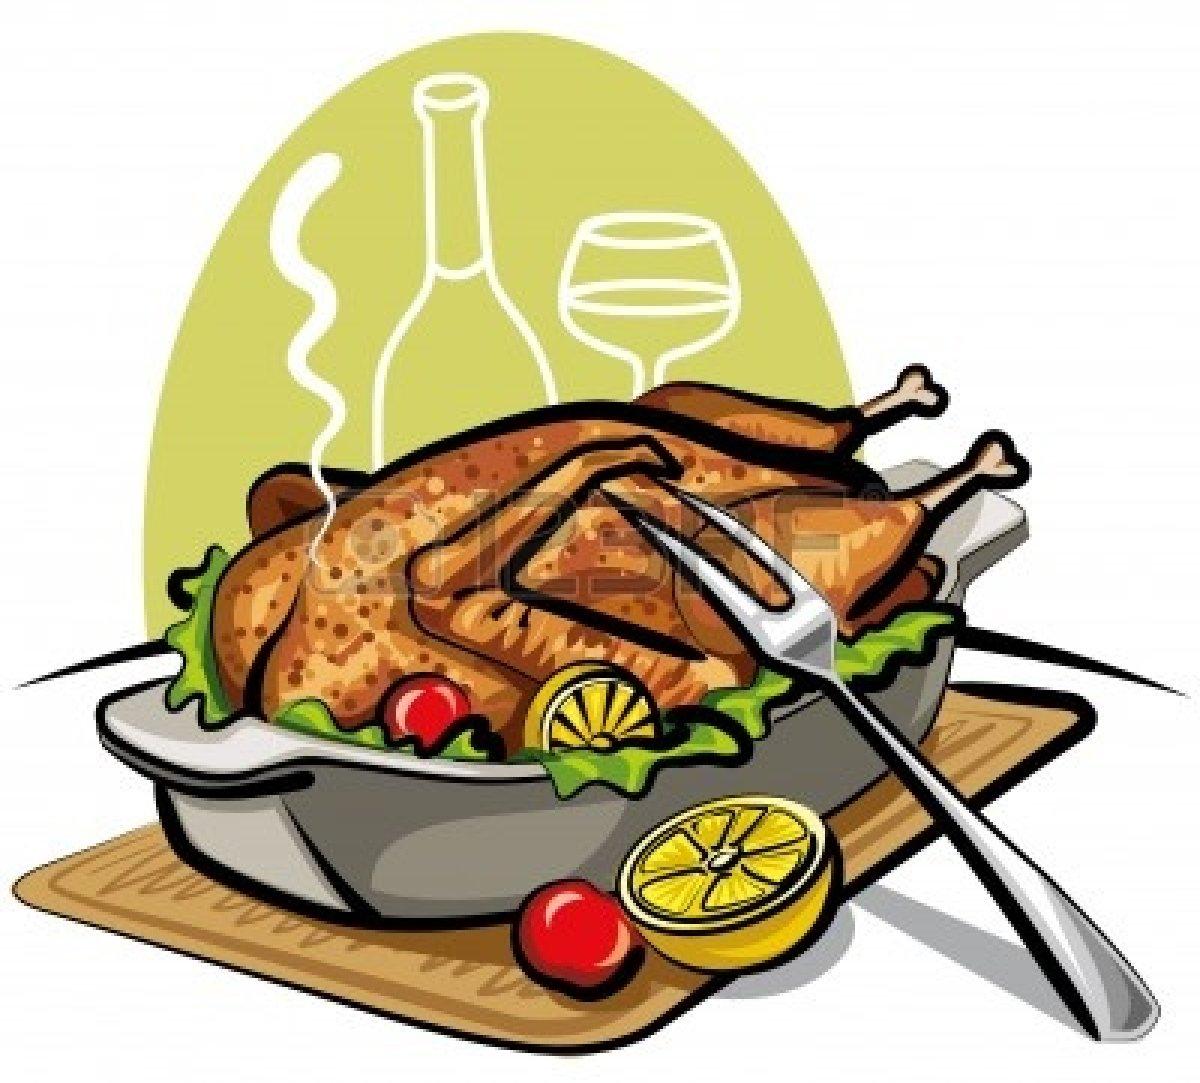 Roast clipart Chicken Images Clipart Clipart roast%20clipart